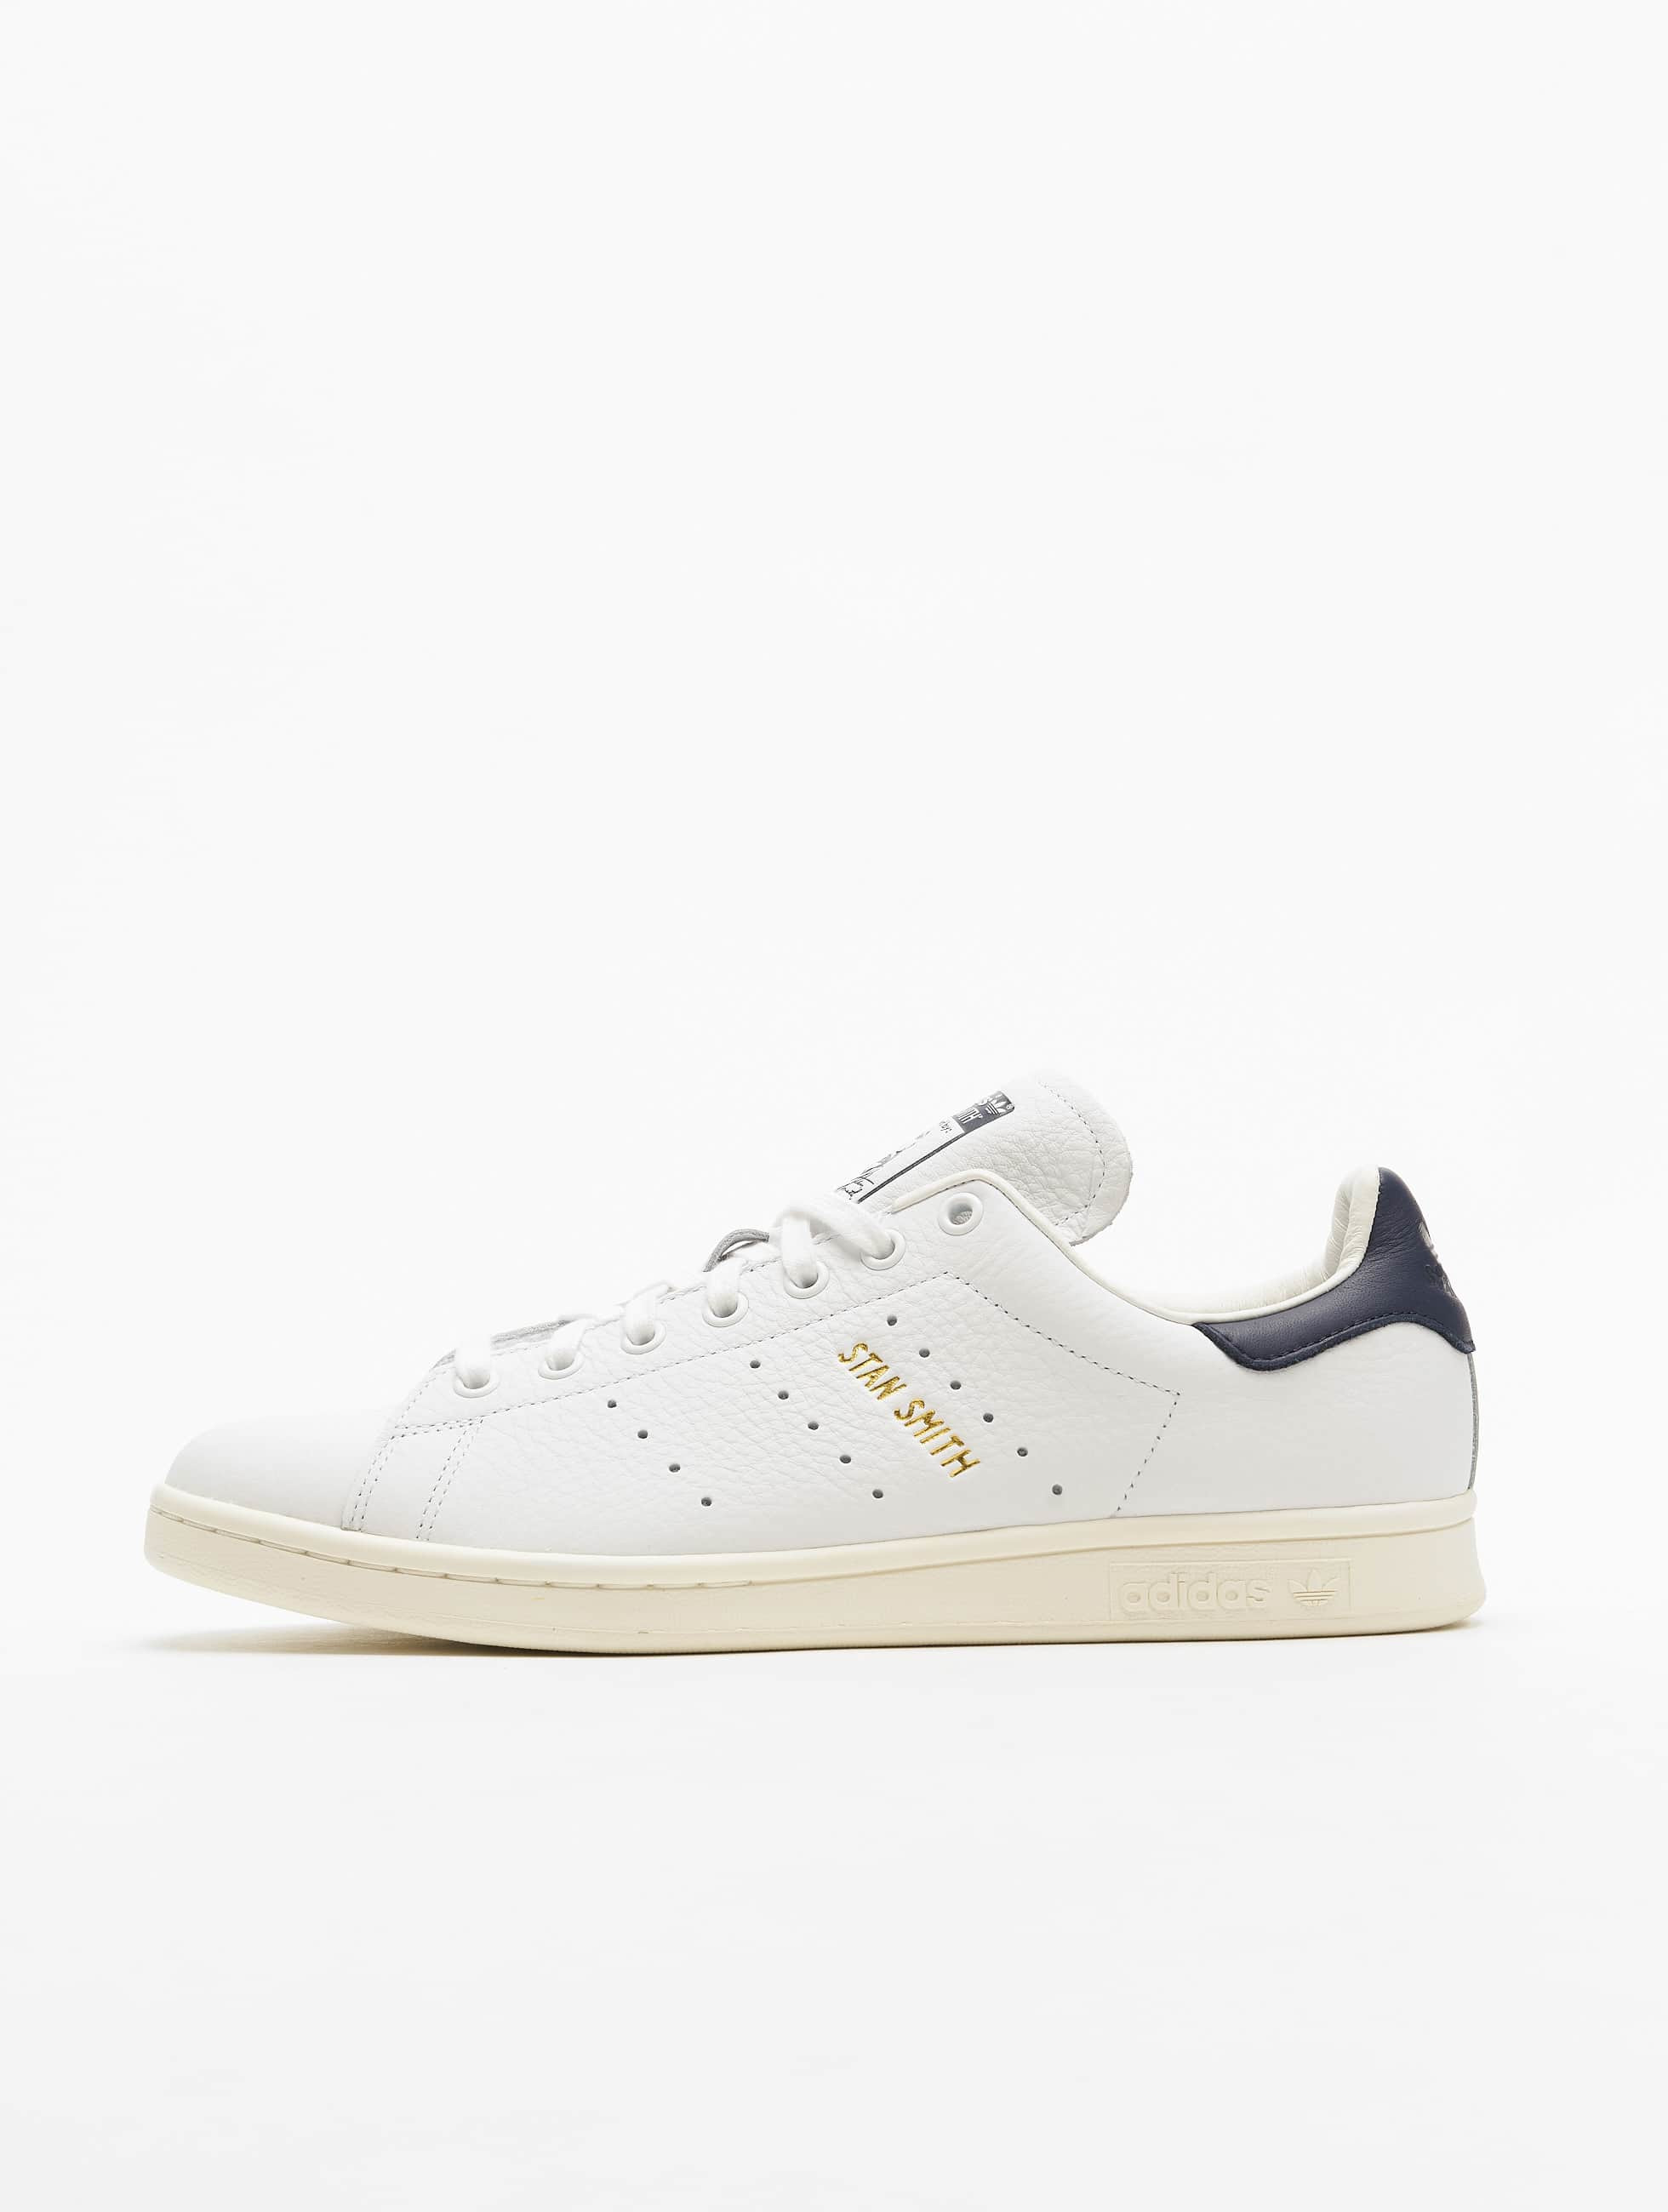 Sneakers, Adidas Superstar 80s, str. 44,5, Linen